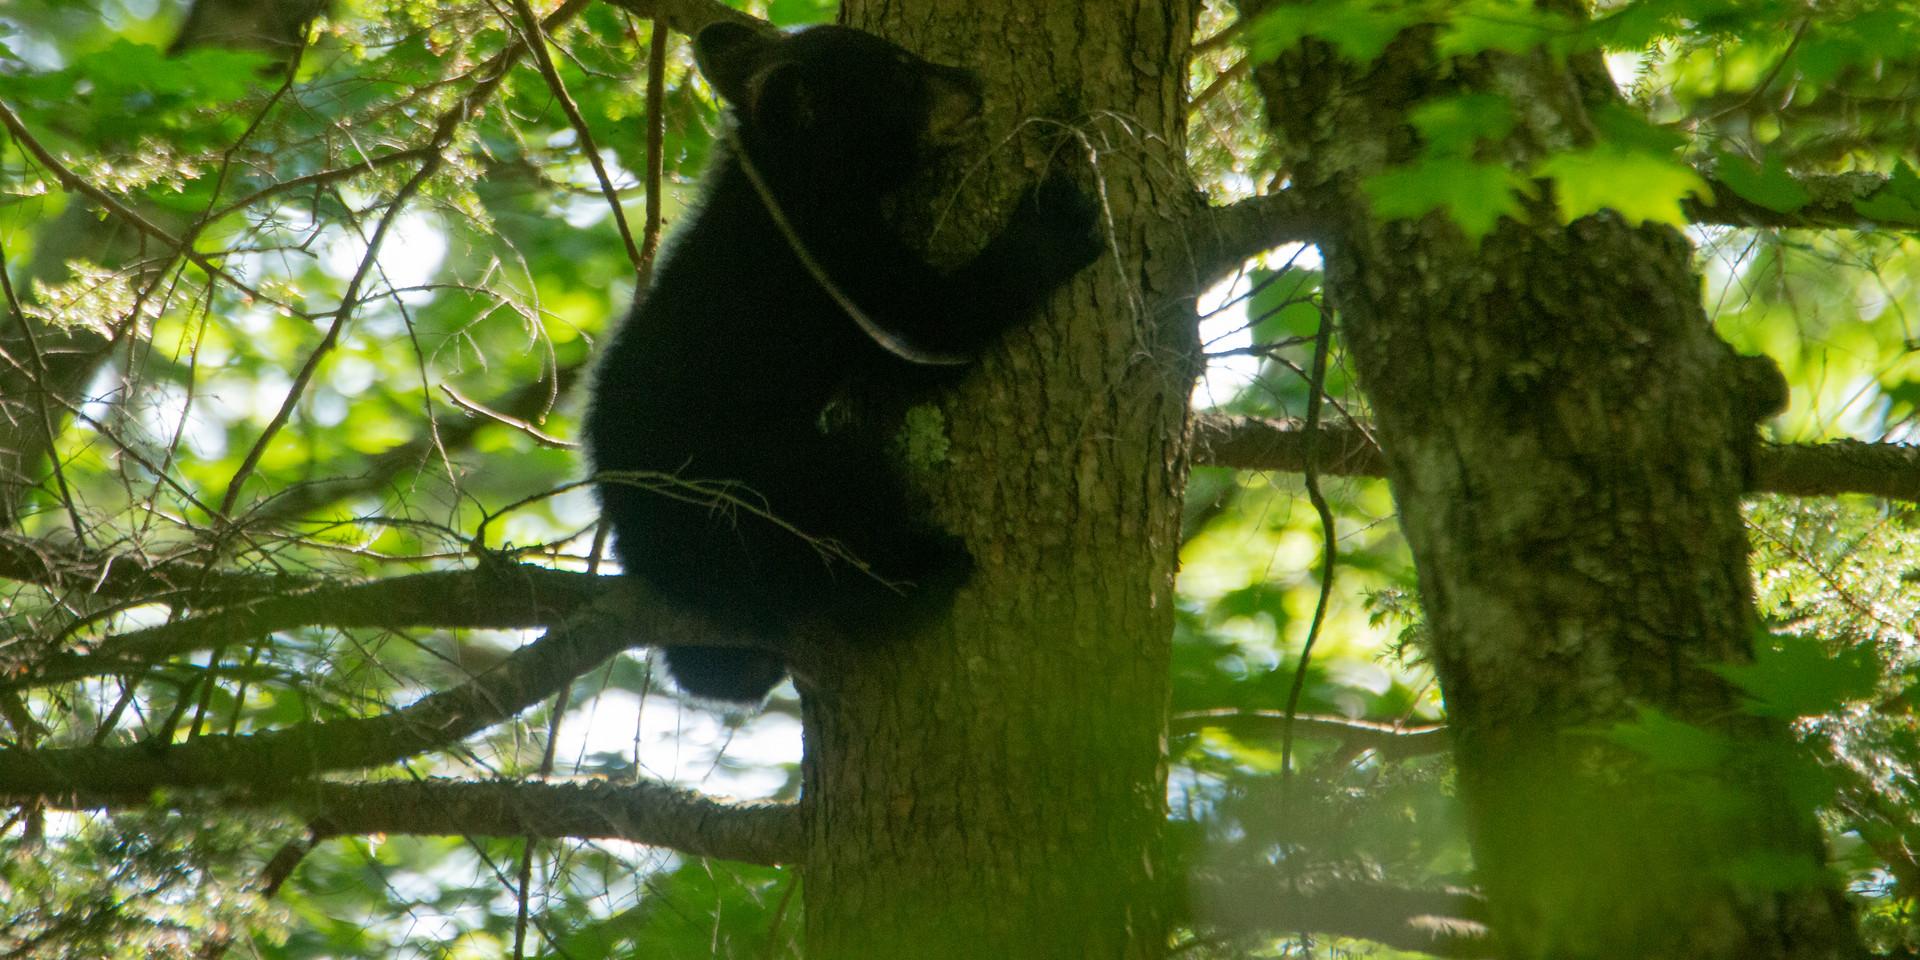 American Black Bear Cub (~4 months old)